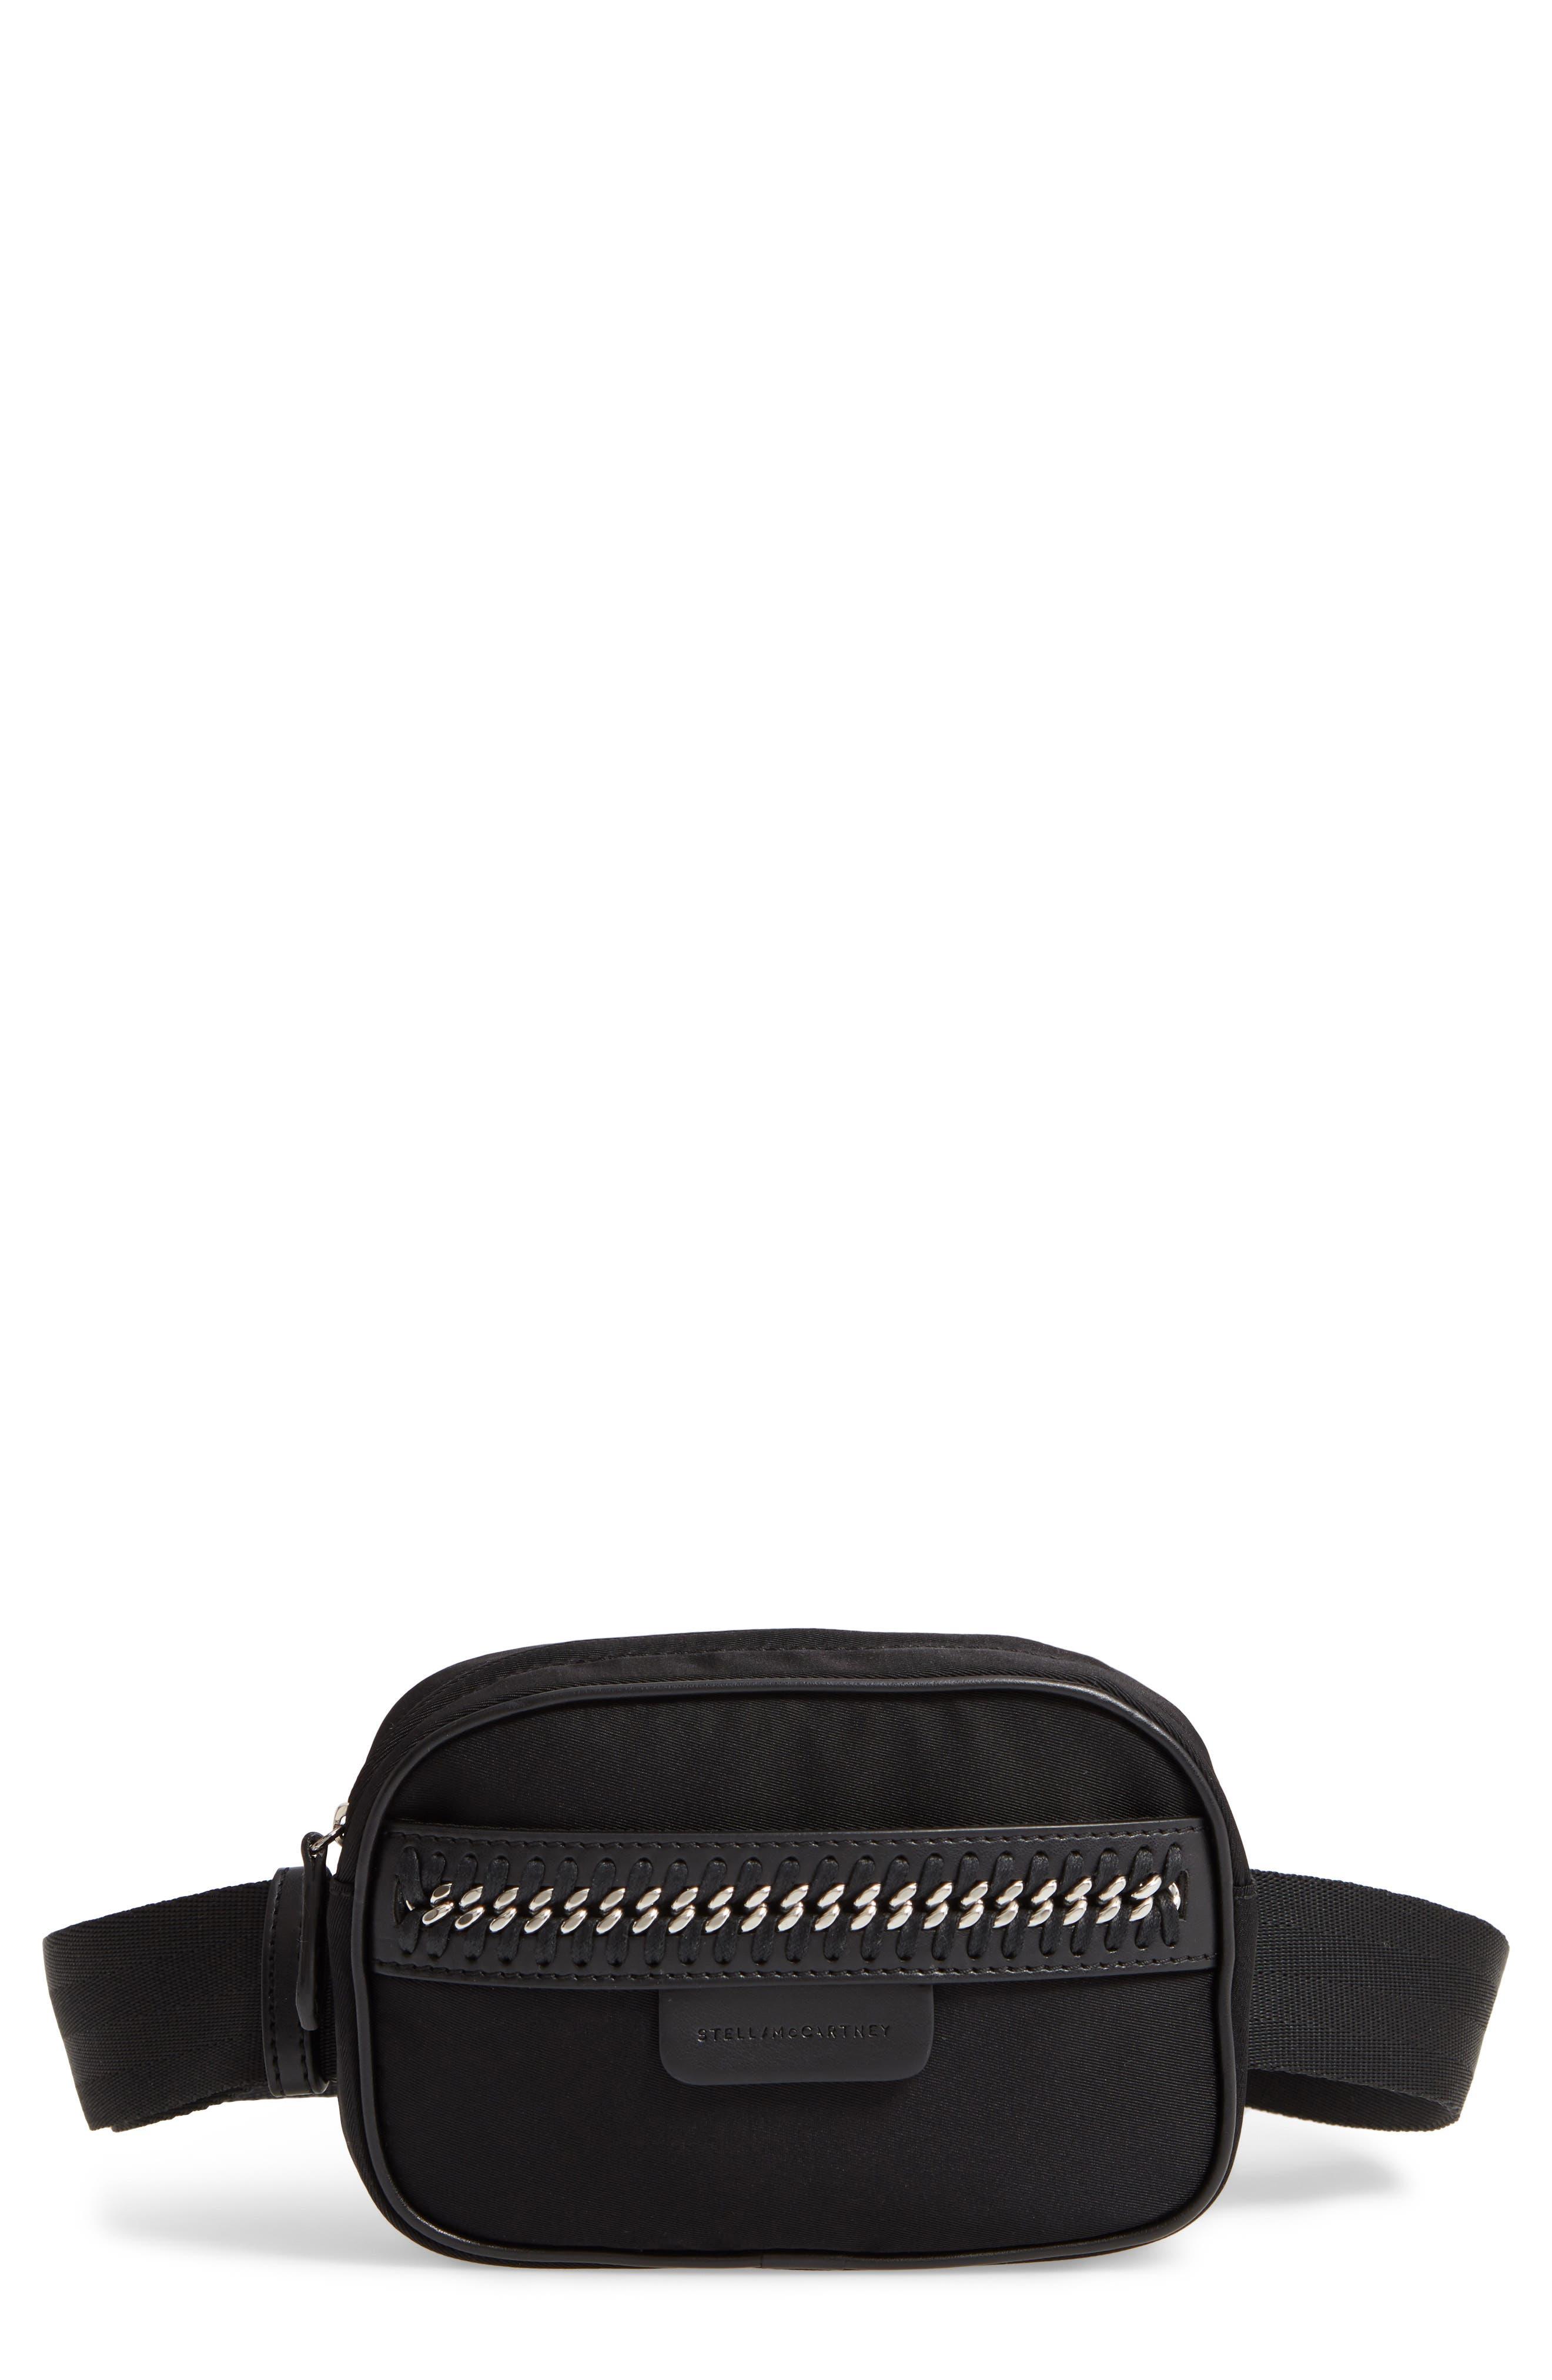 Nylon Convertible Belt Bag,                             Main thumbnail 1, color,                             BLACK/ SILVER